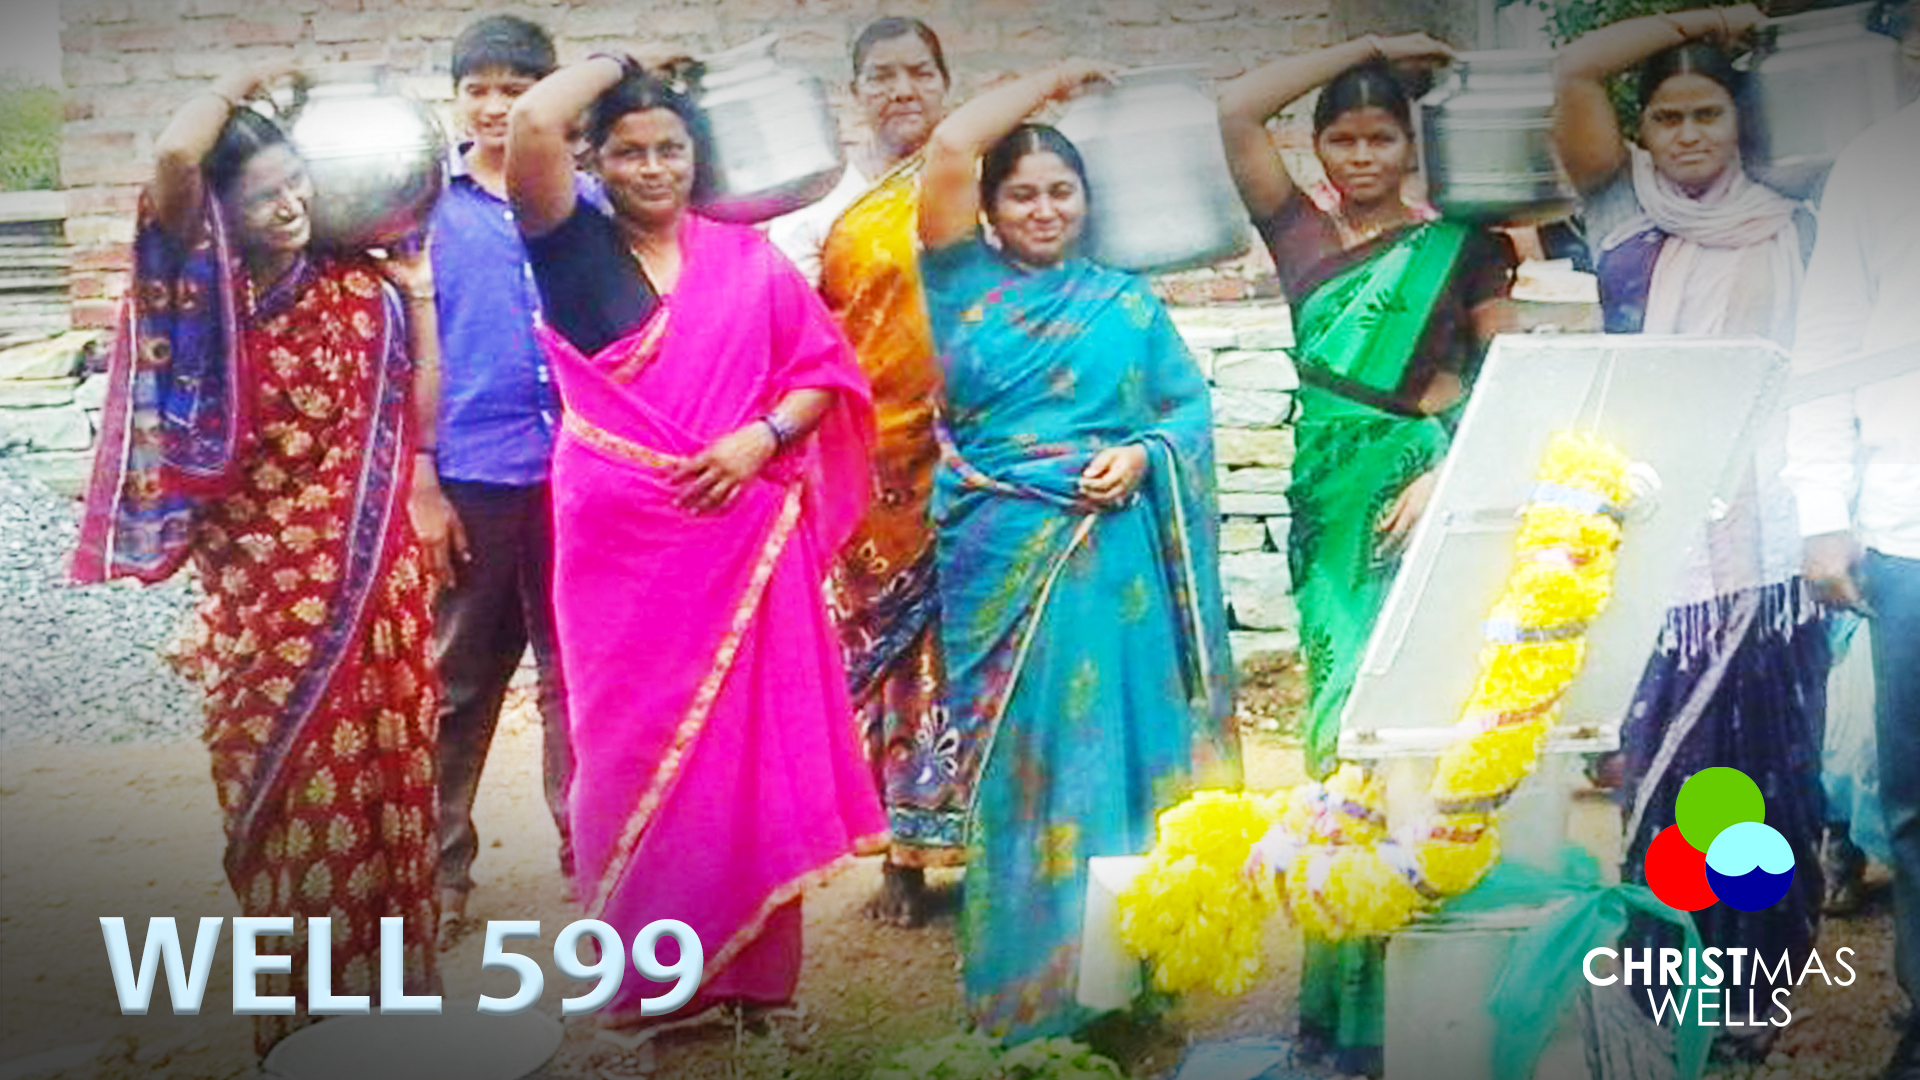 599_Wells-Set_2016-02_India_1920x1080.jpg